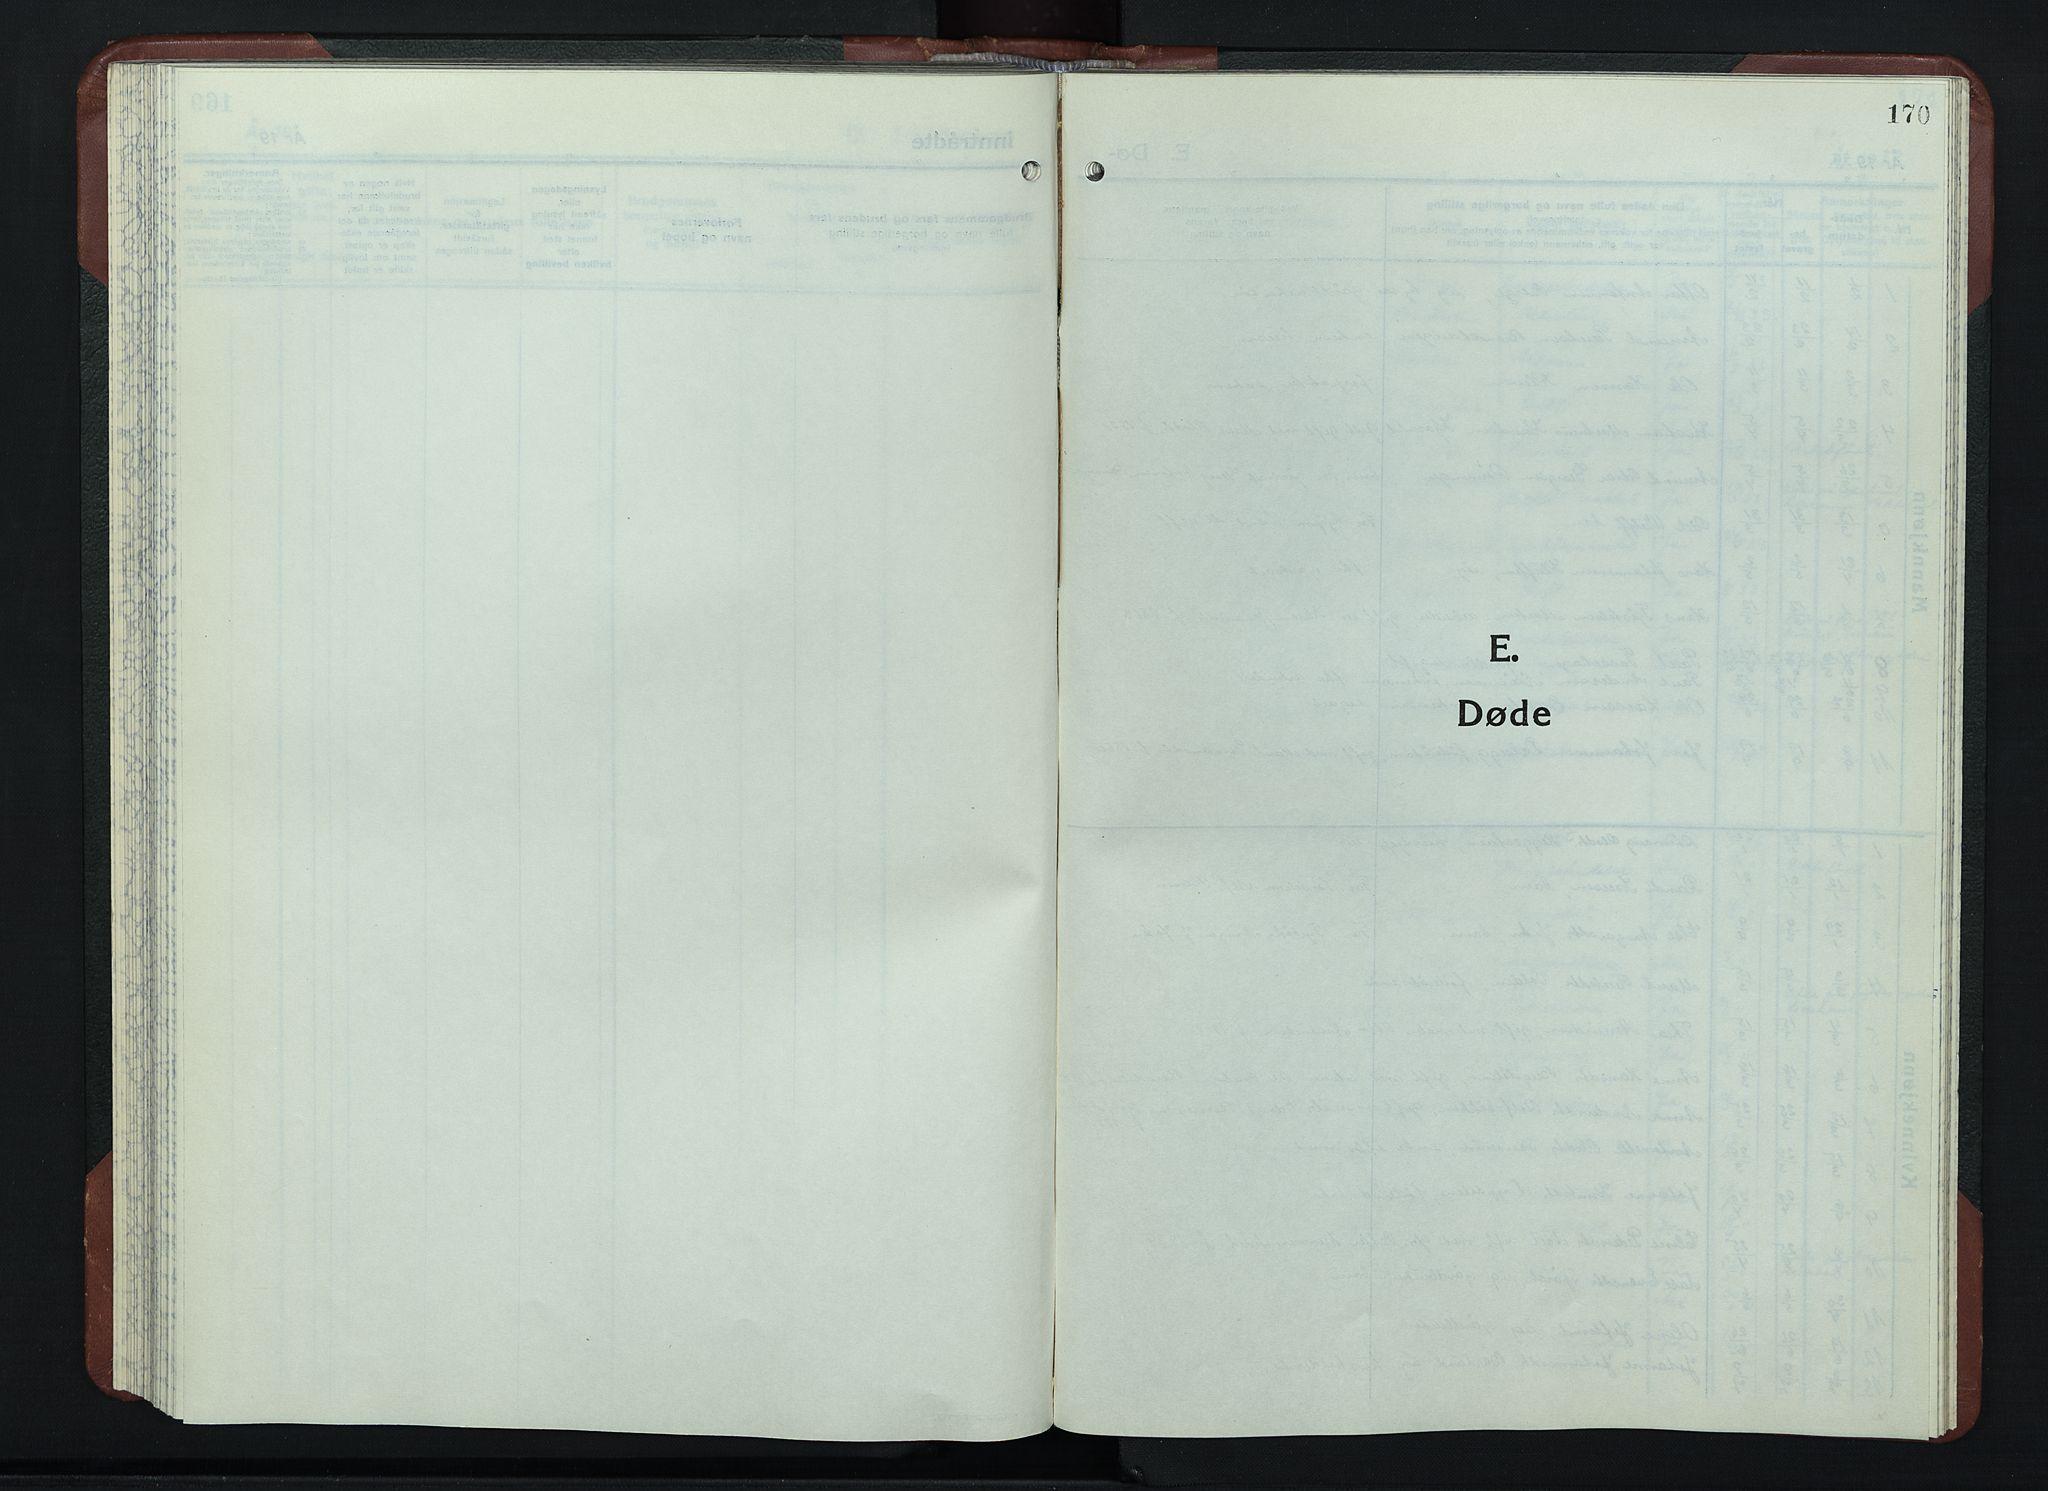 SAH, Sør-Fron prestekontor, H/Ha/Hab/L0006: Klokkerbok nr. 6, 1933-1948, s. 170